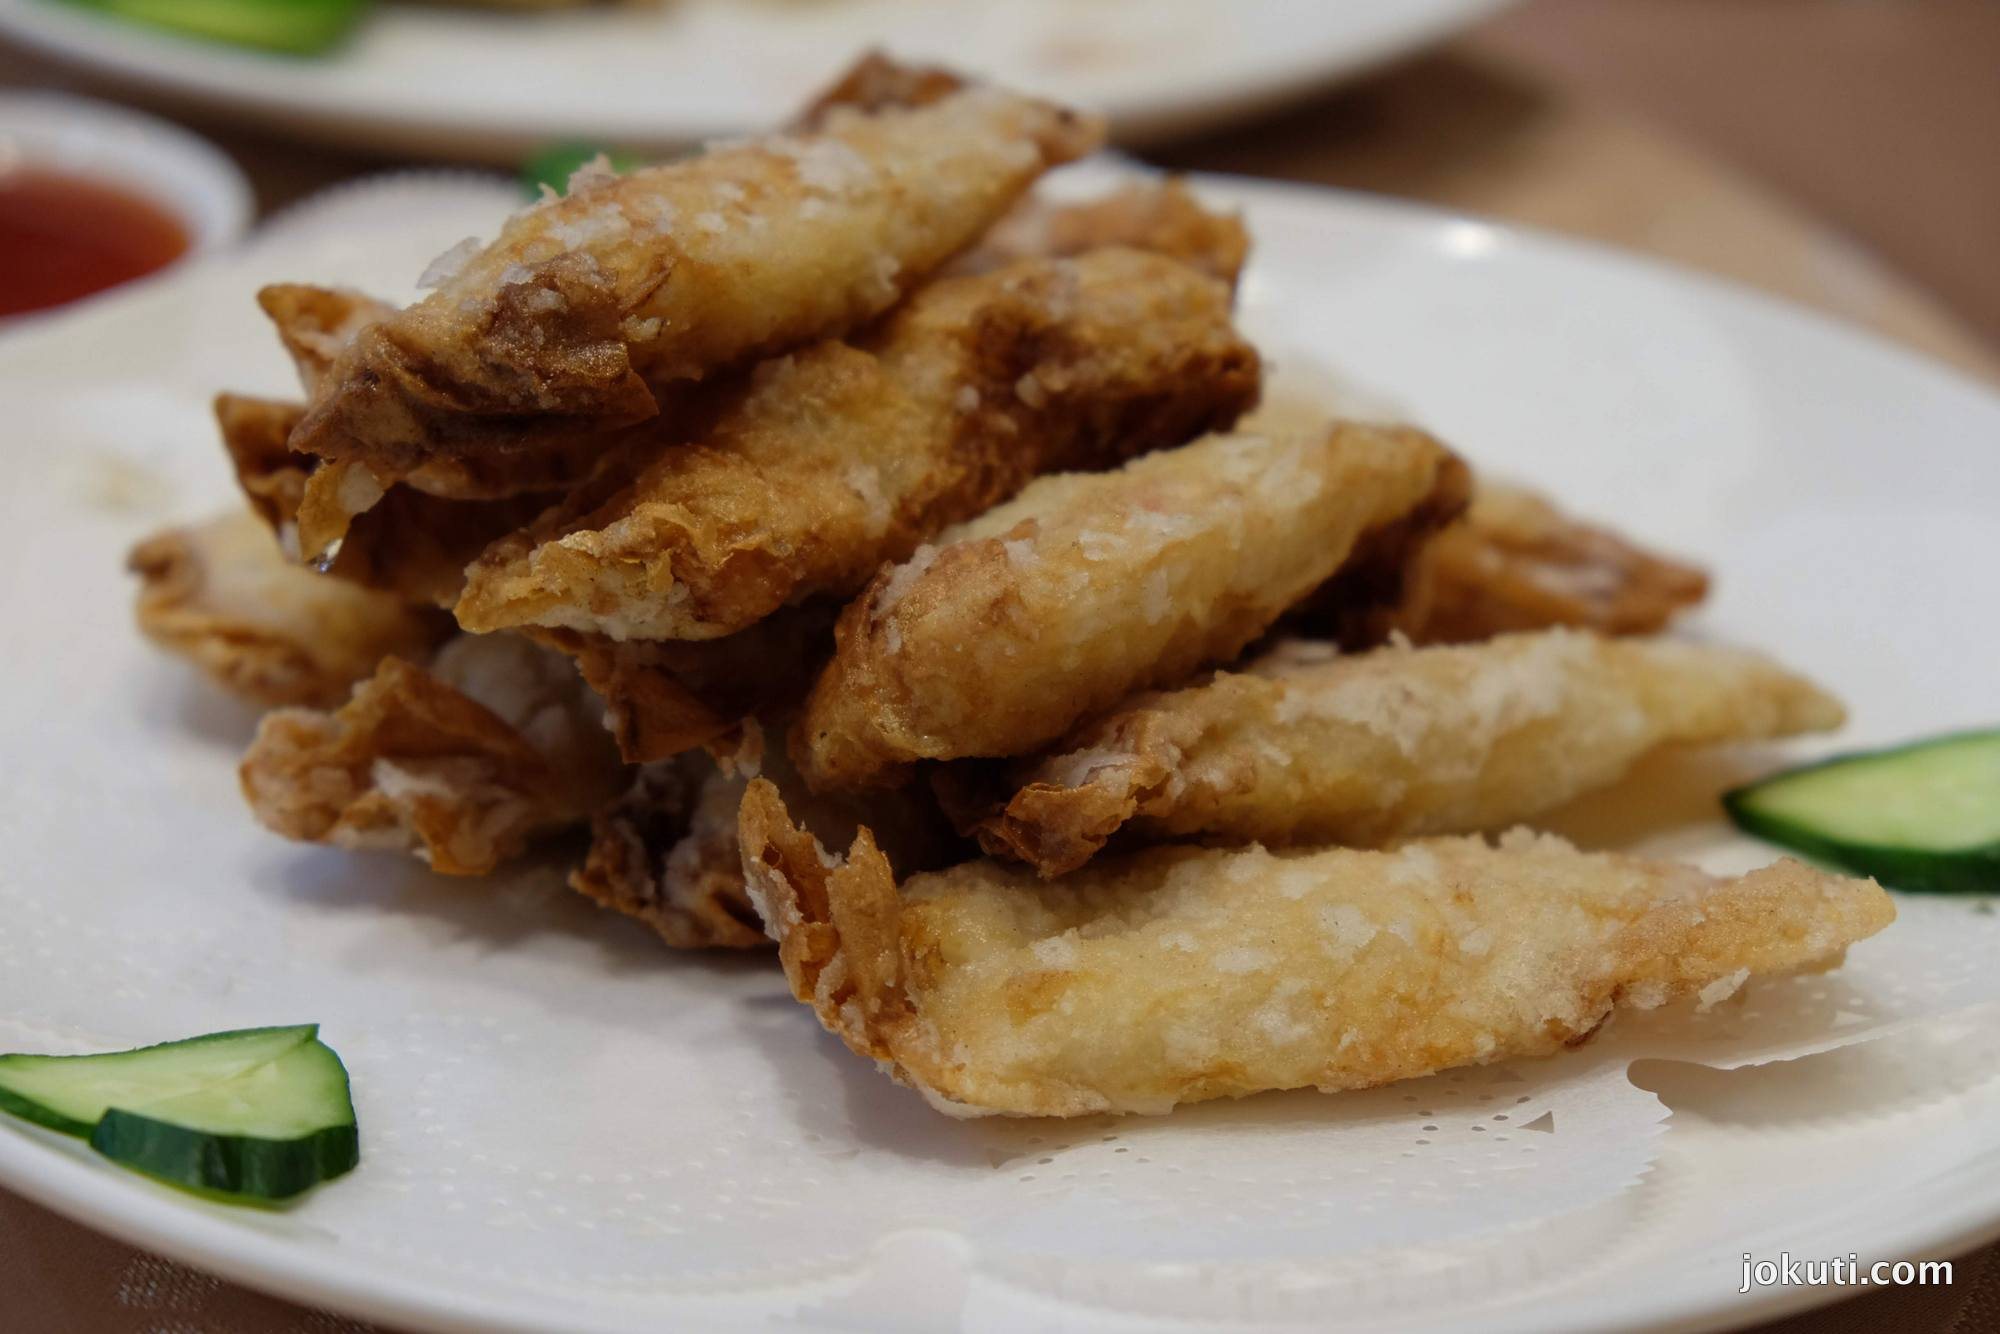 dscf2918_taipei_ming_fu_seafood_michelin_taiwan_vilagevo_jokuti.jpg